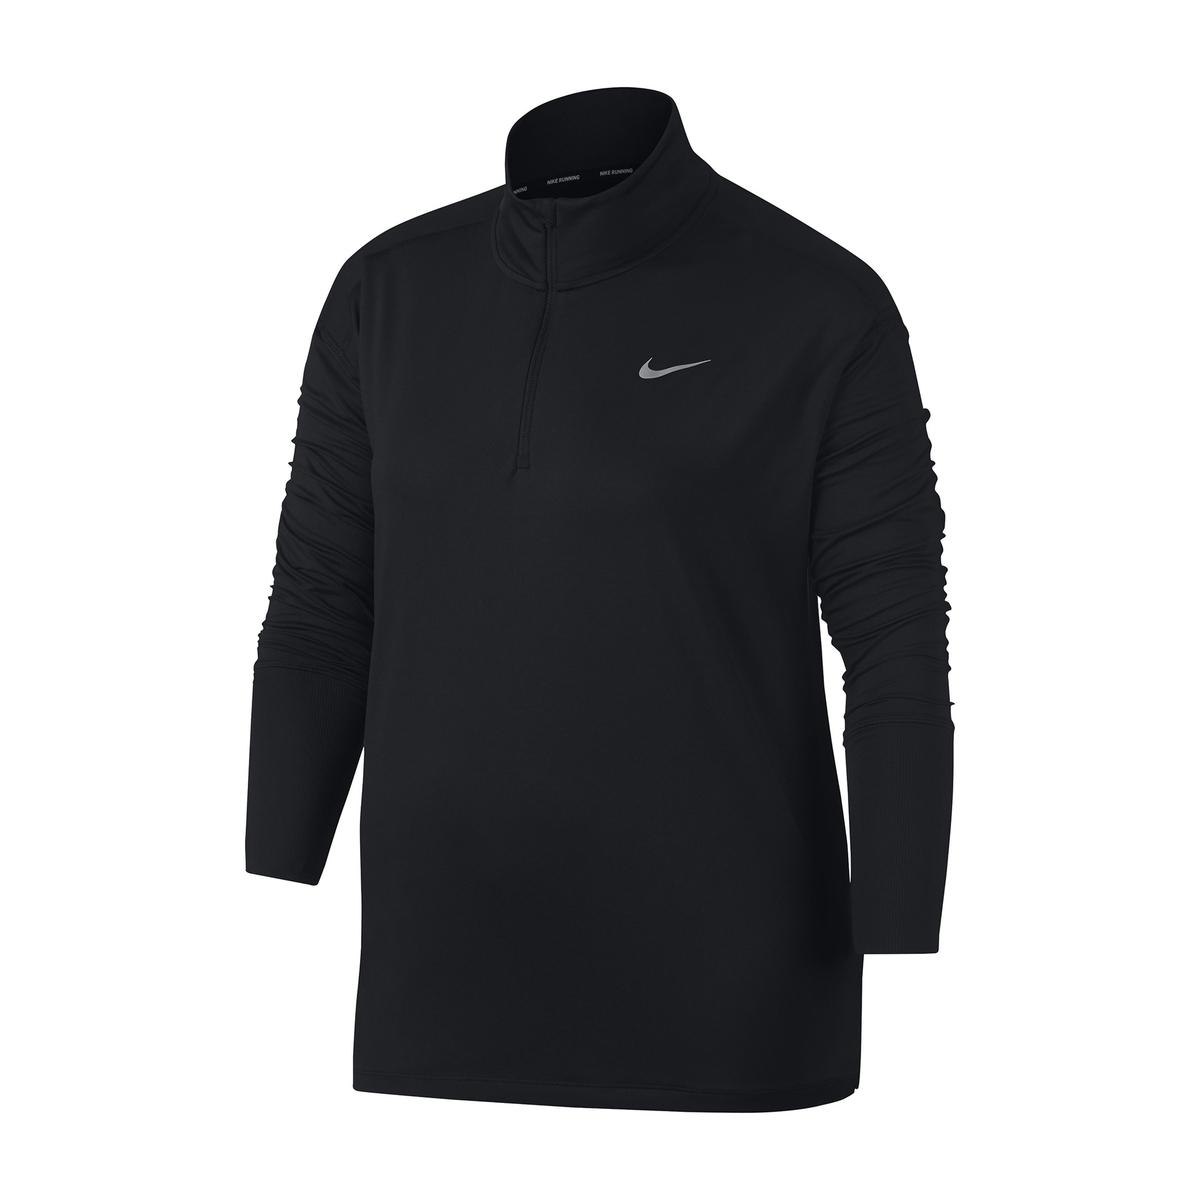 Imagen principal de producto de Camiseta para mujer de manga larga, con cremallera - Nike